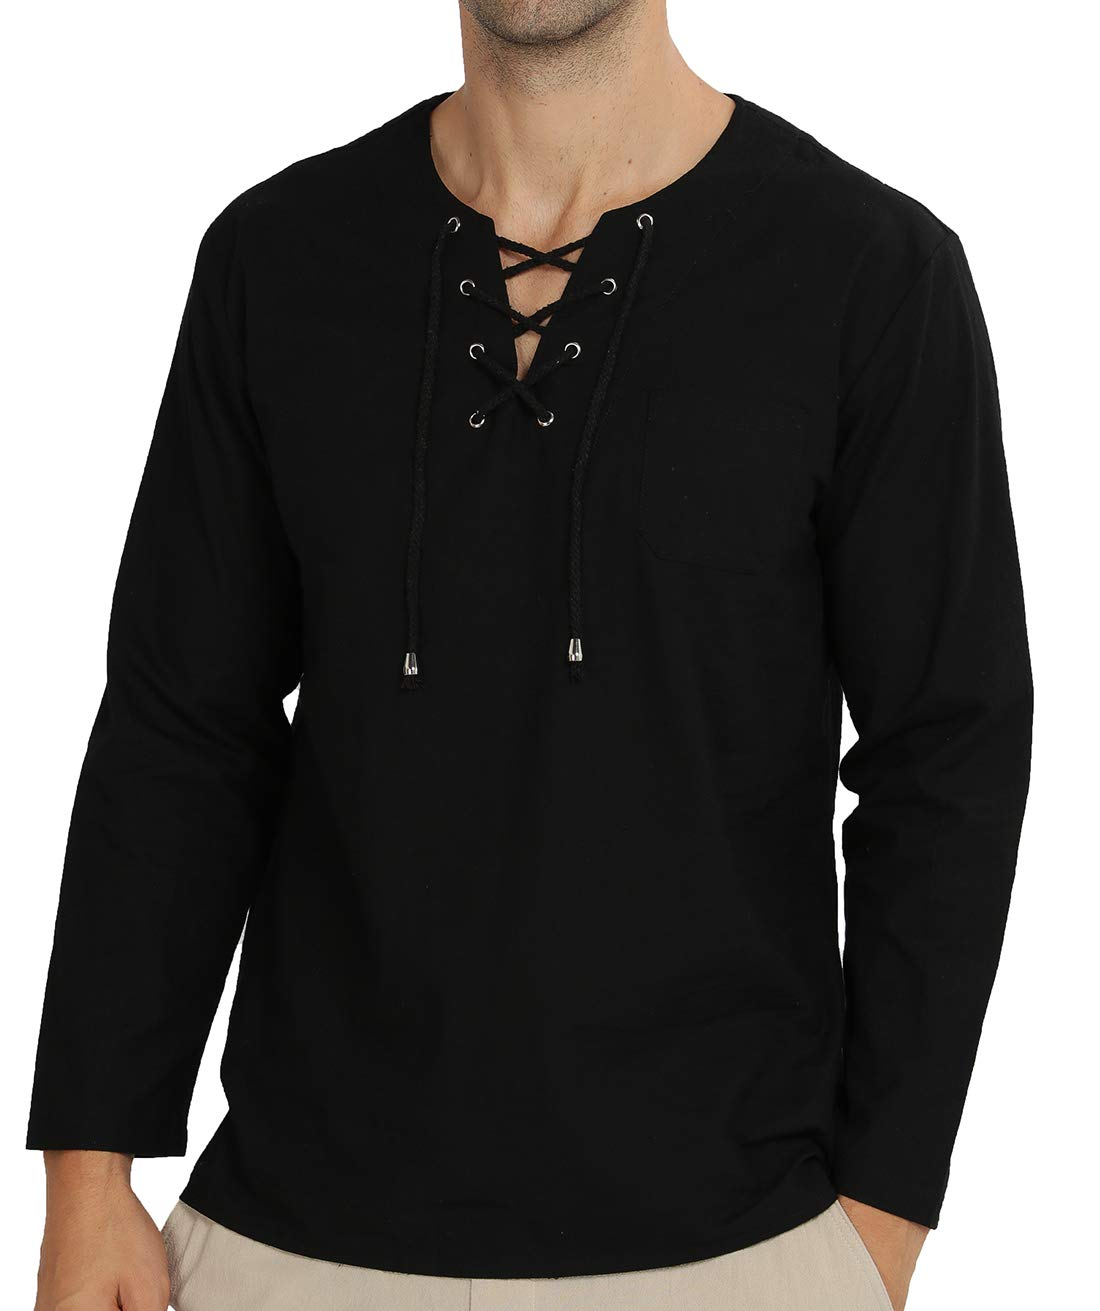 WULFUL Men's Casual Long Sleeve Hippie Summer Beach Yoga Shirts Cotton Fashion T-Shirt